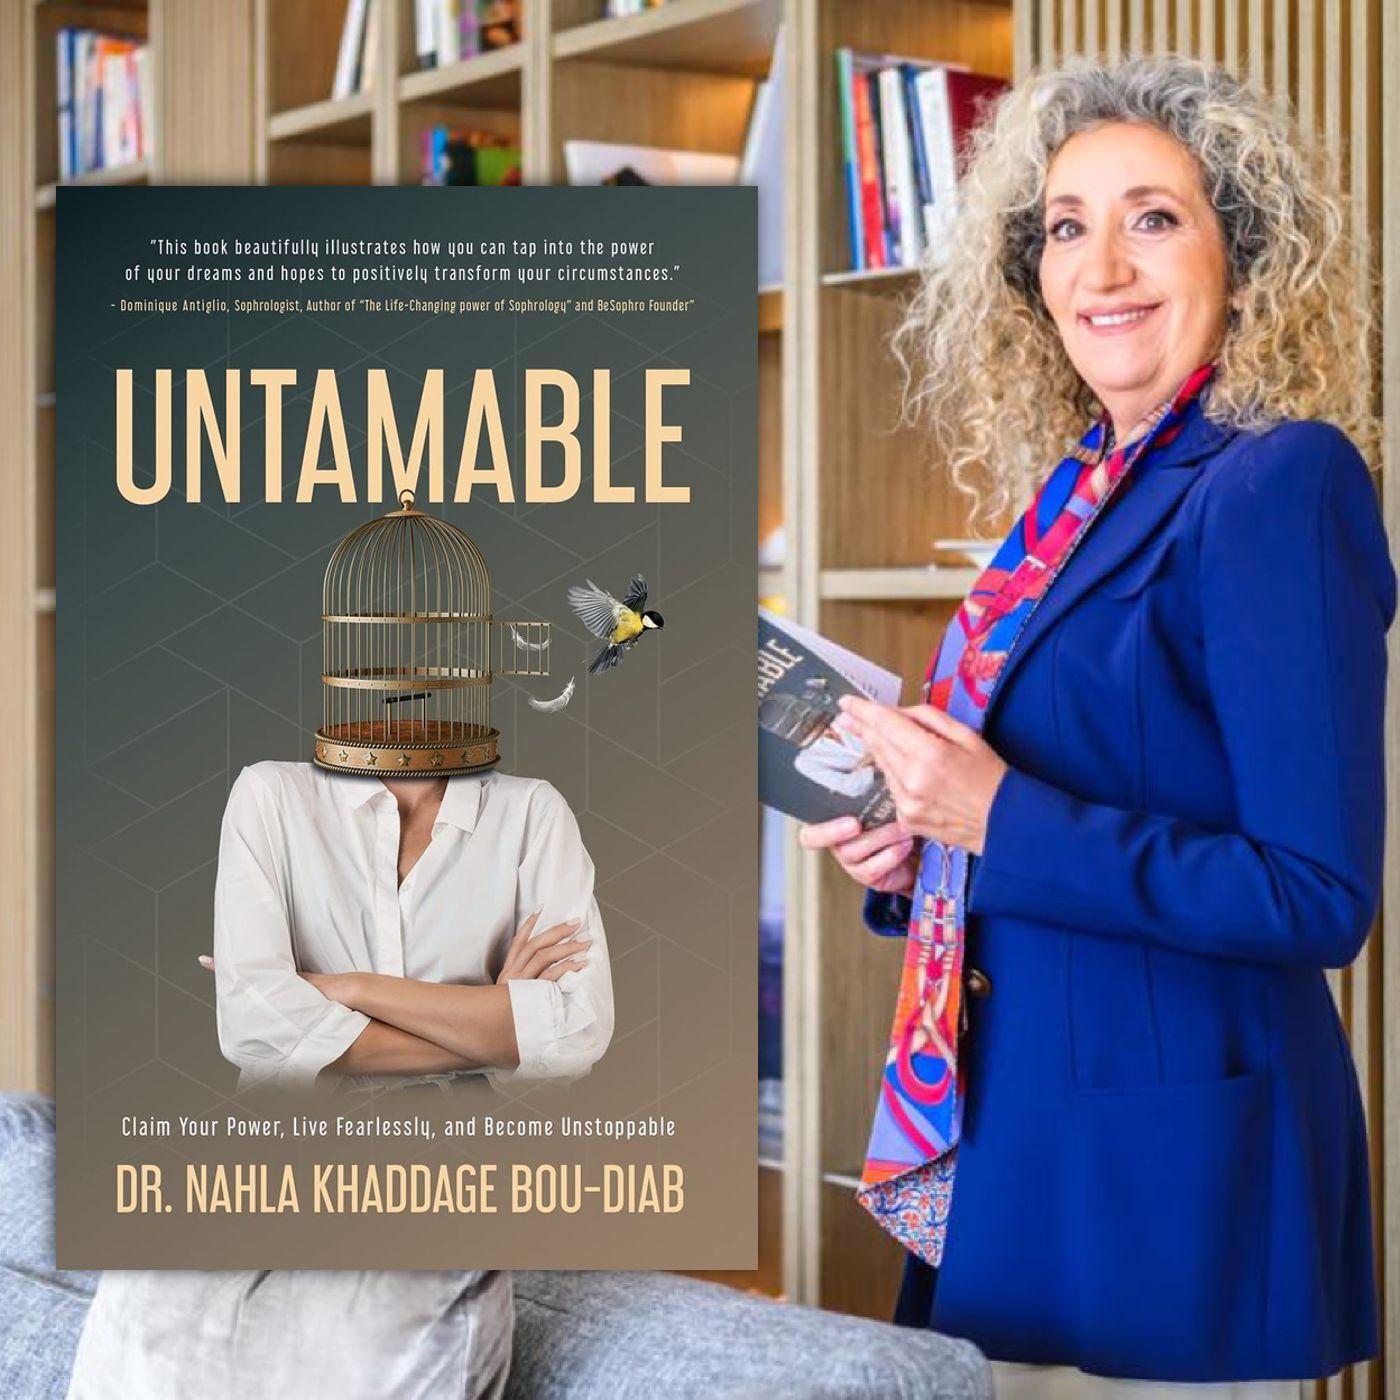 Untamable with Dr. Nahla Khaddage Bou-Diab